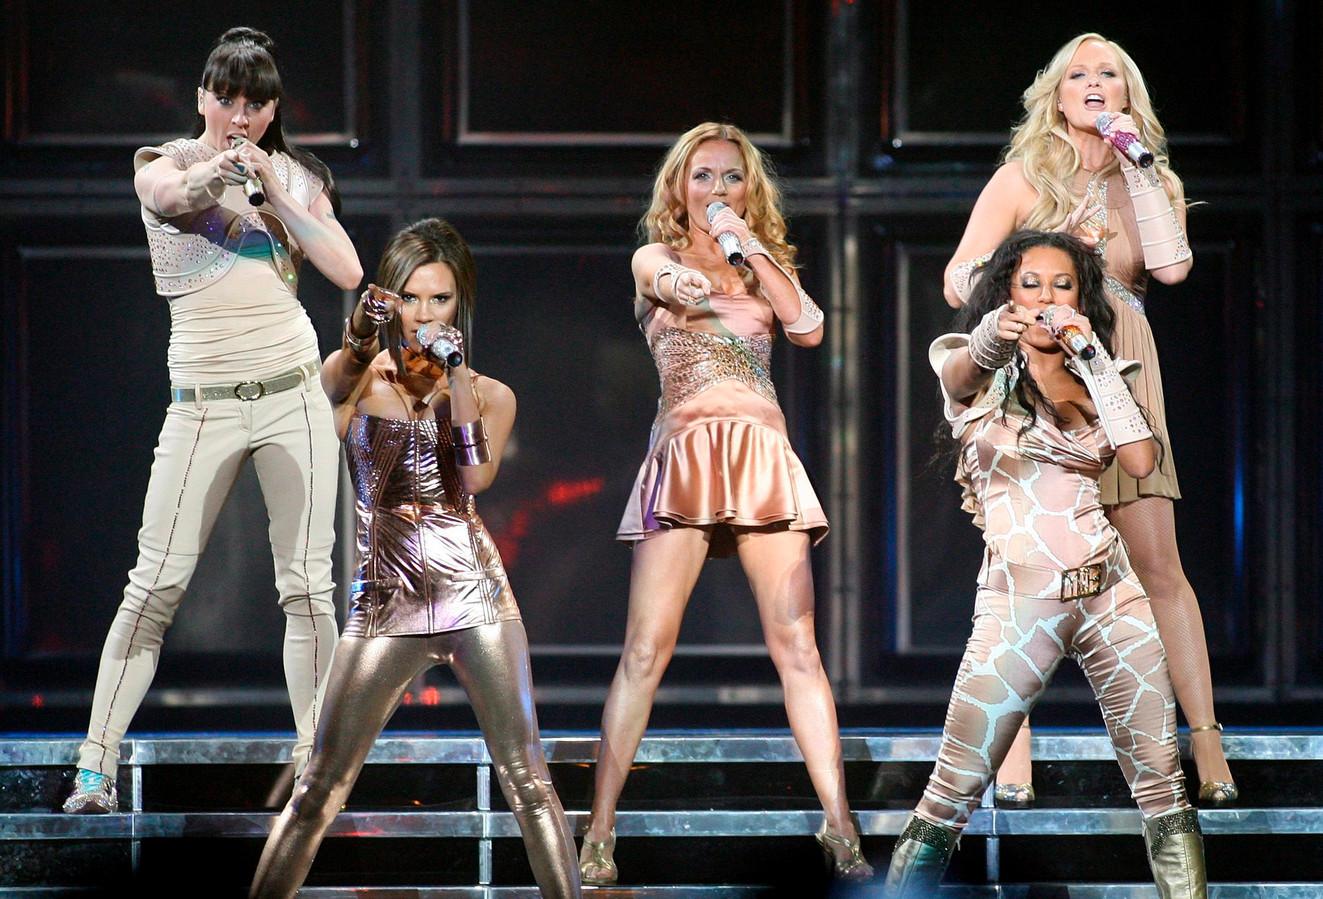 De Spice Girls